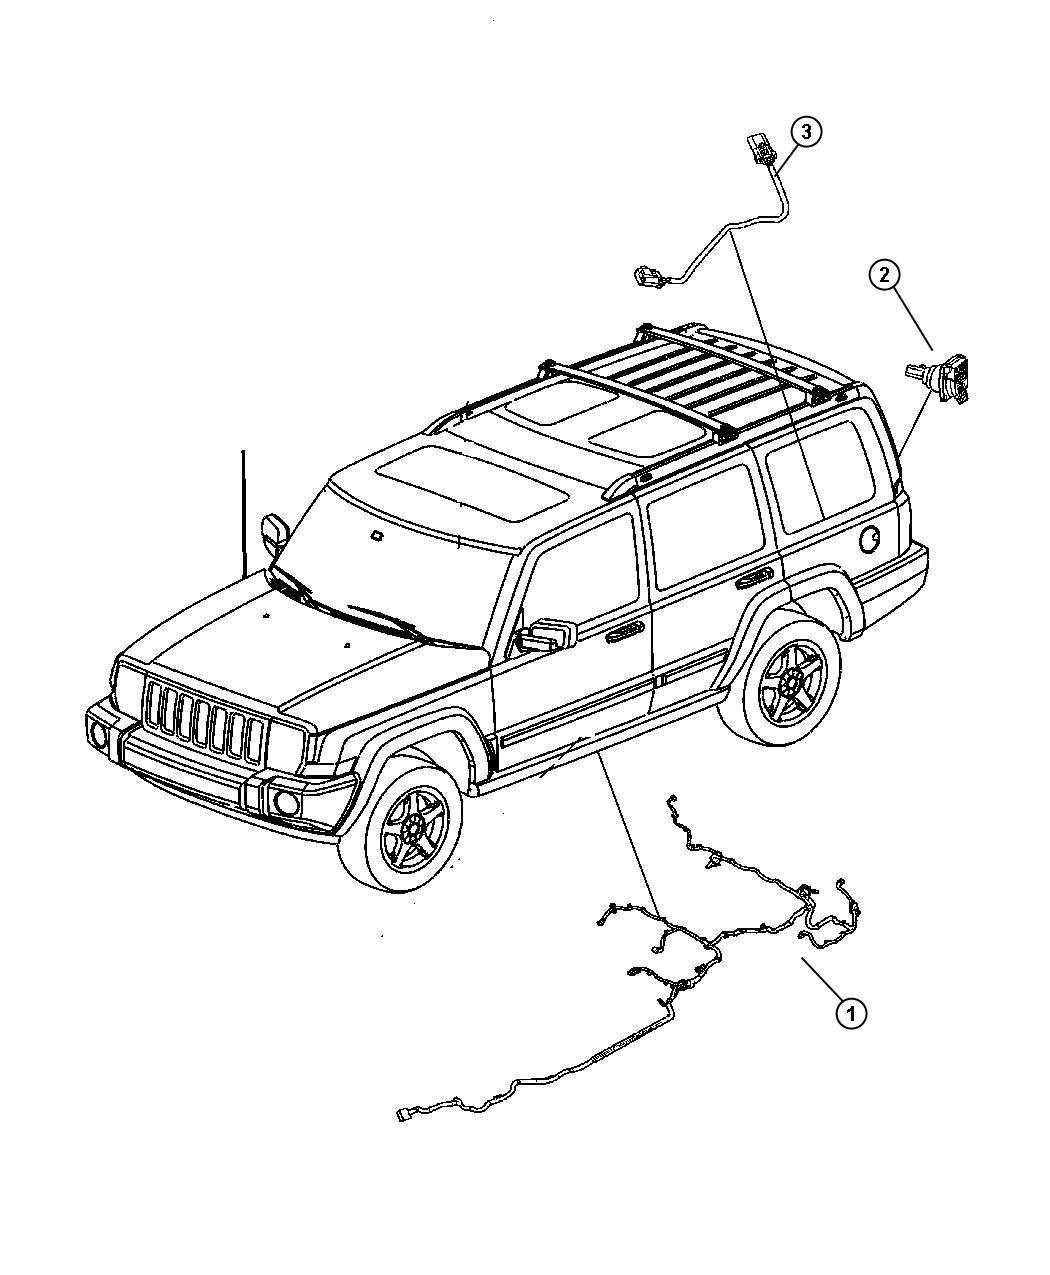 2008 Jeep Commander Wiring. Fuel module. [[21.1 gallon